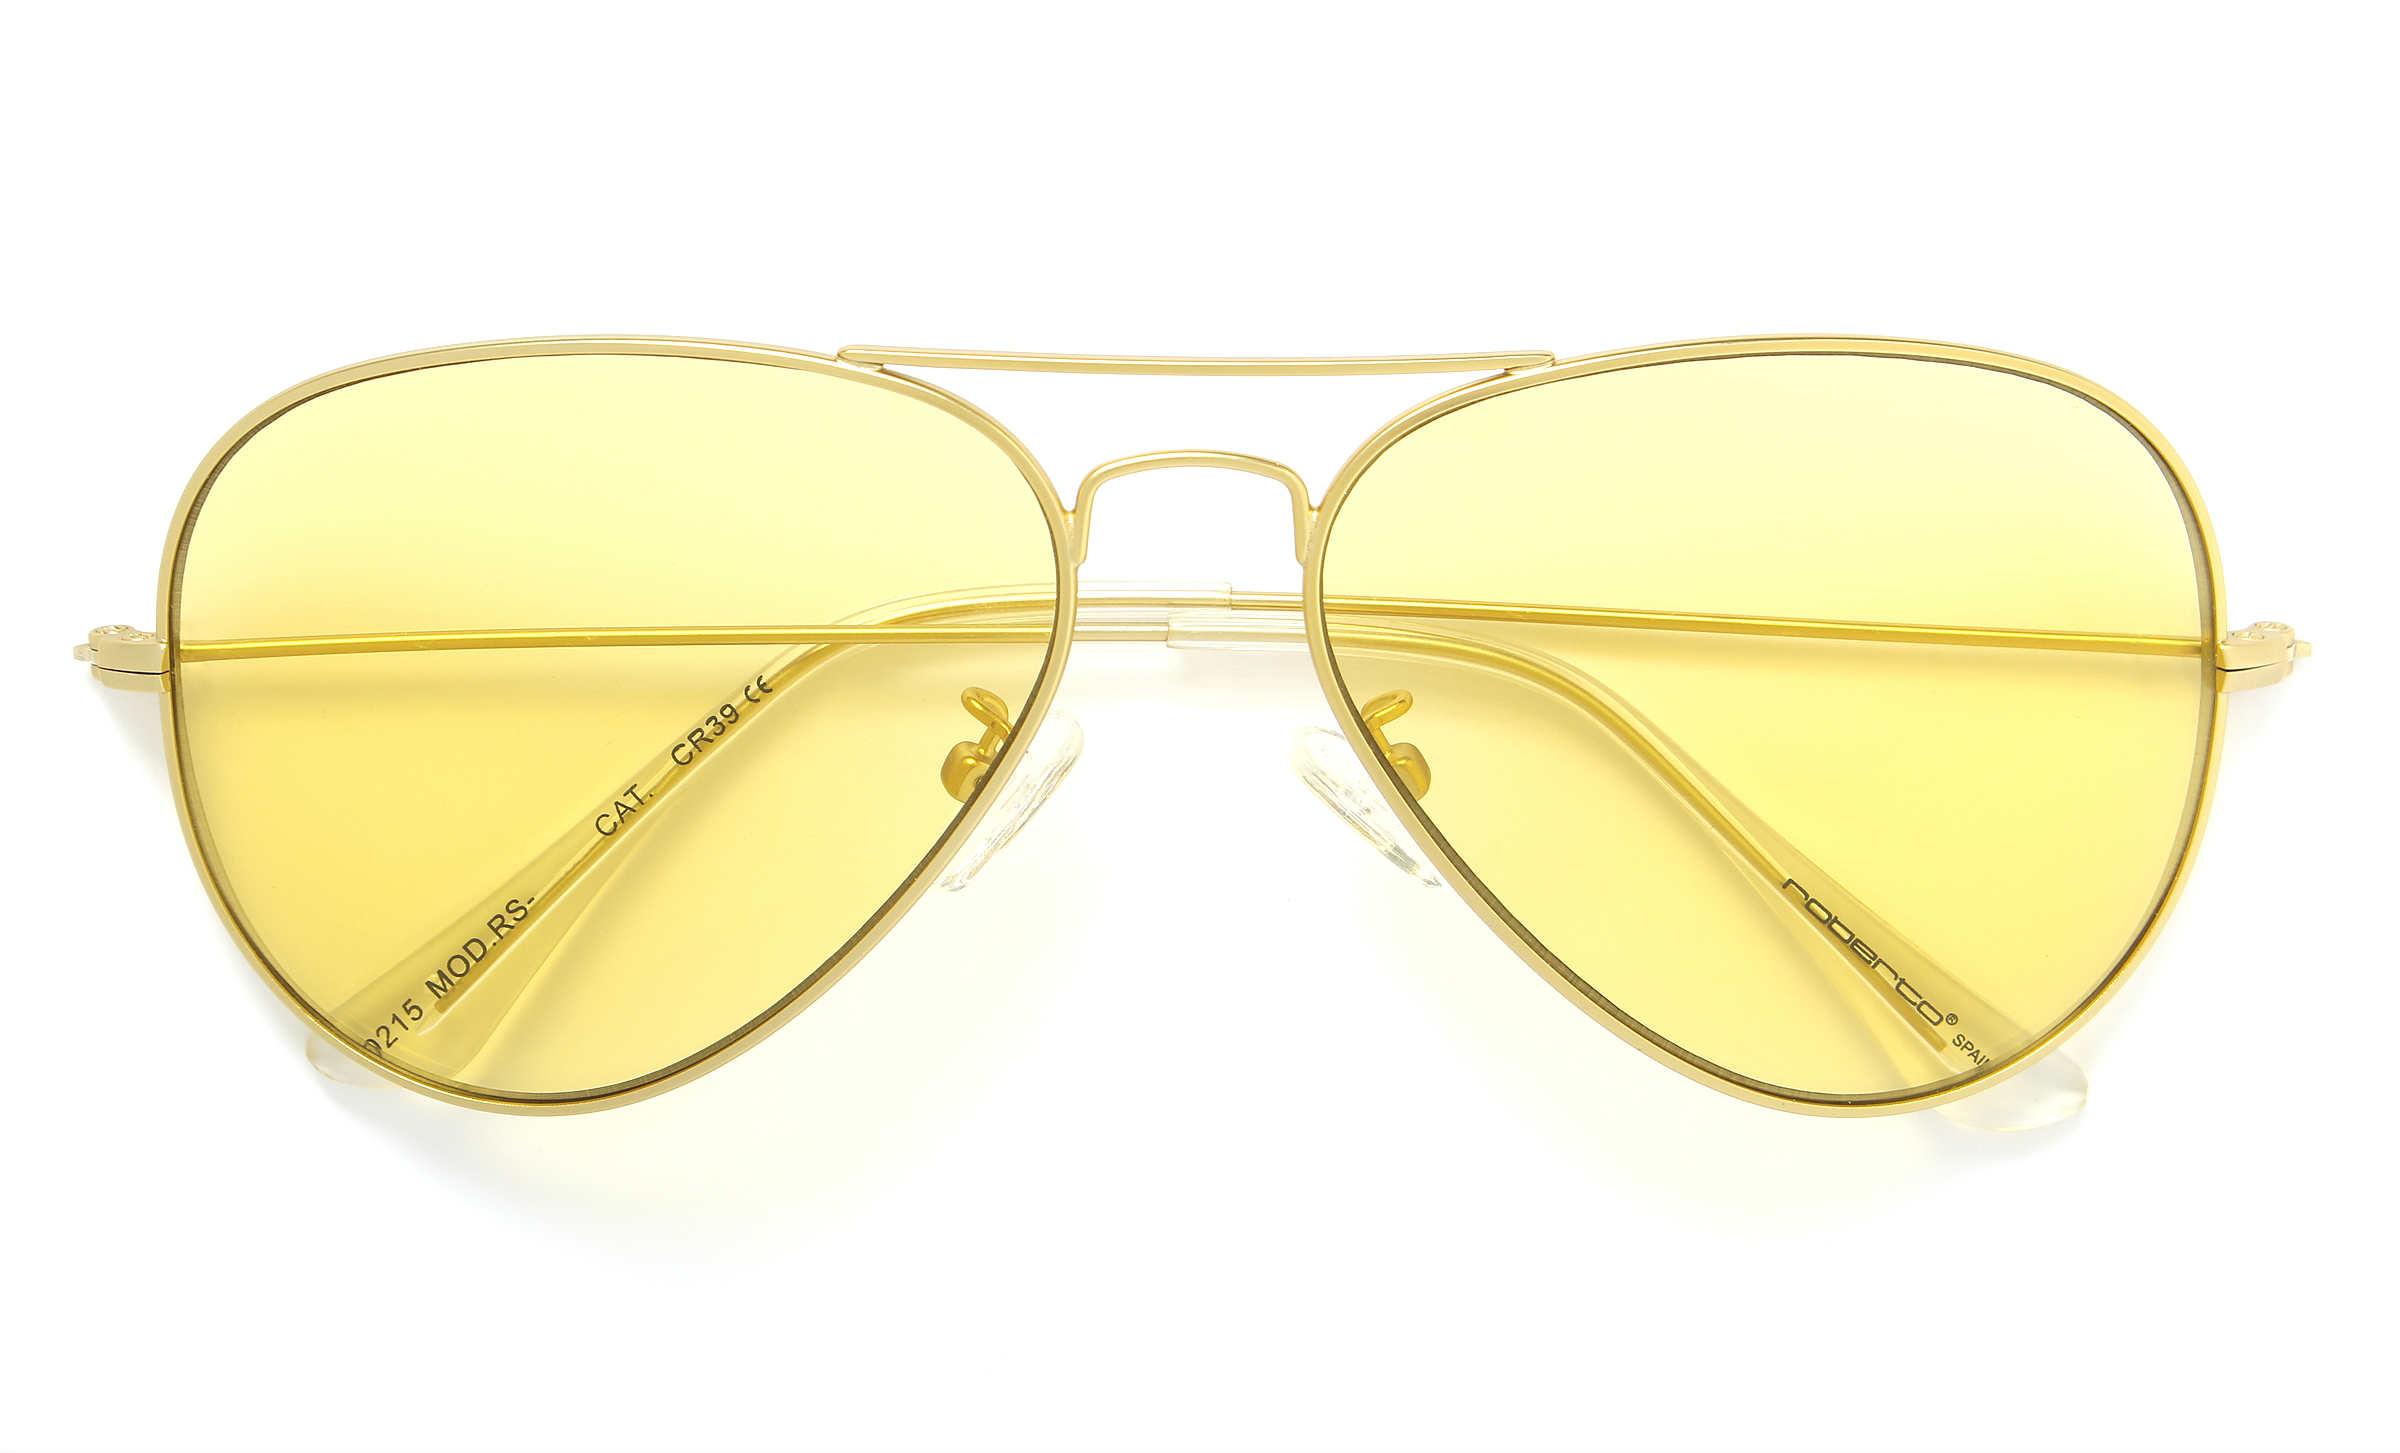 gafas amarillas transparente roberto martin